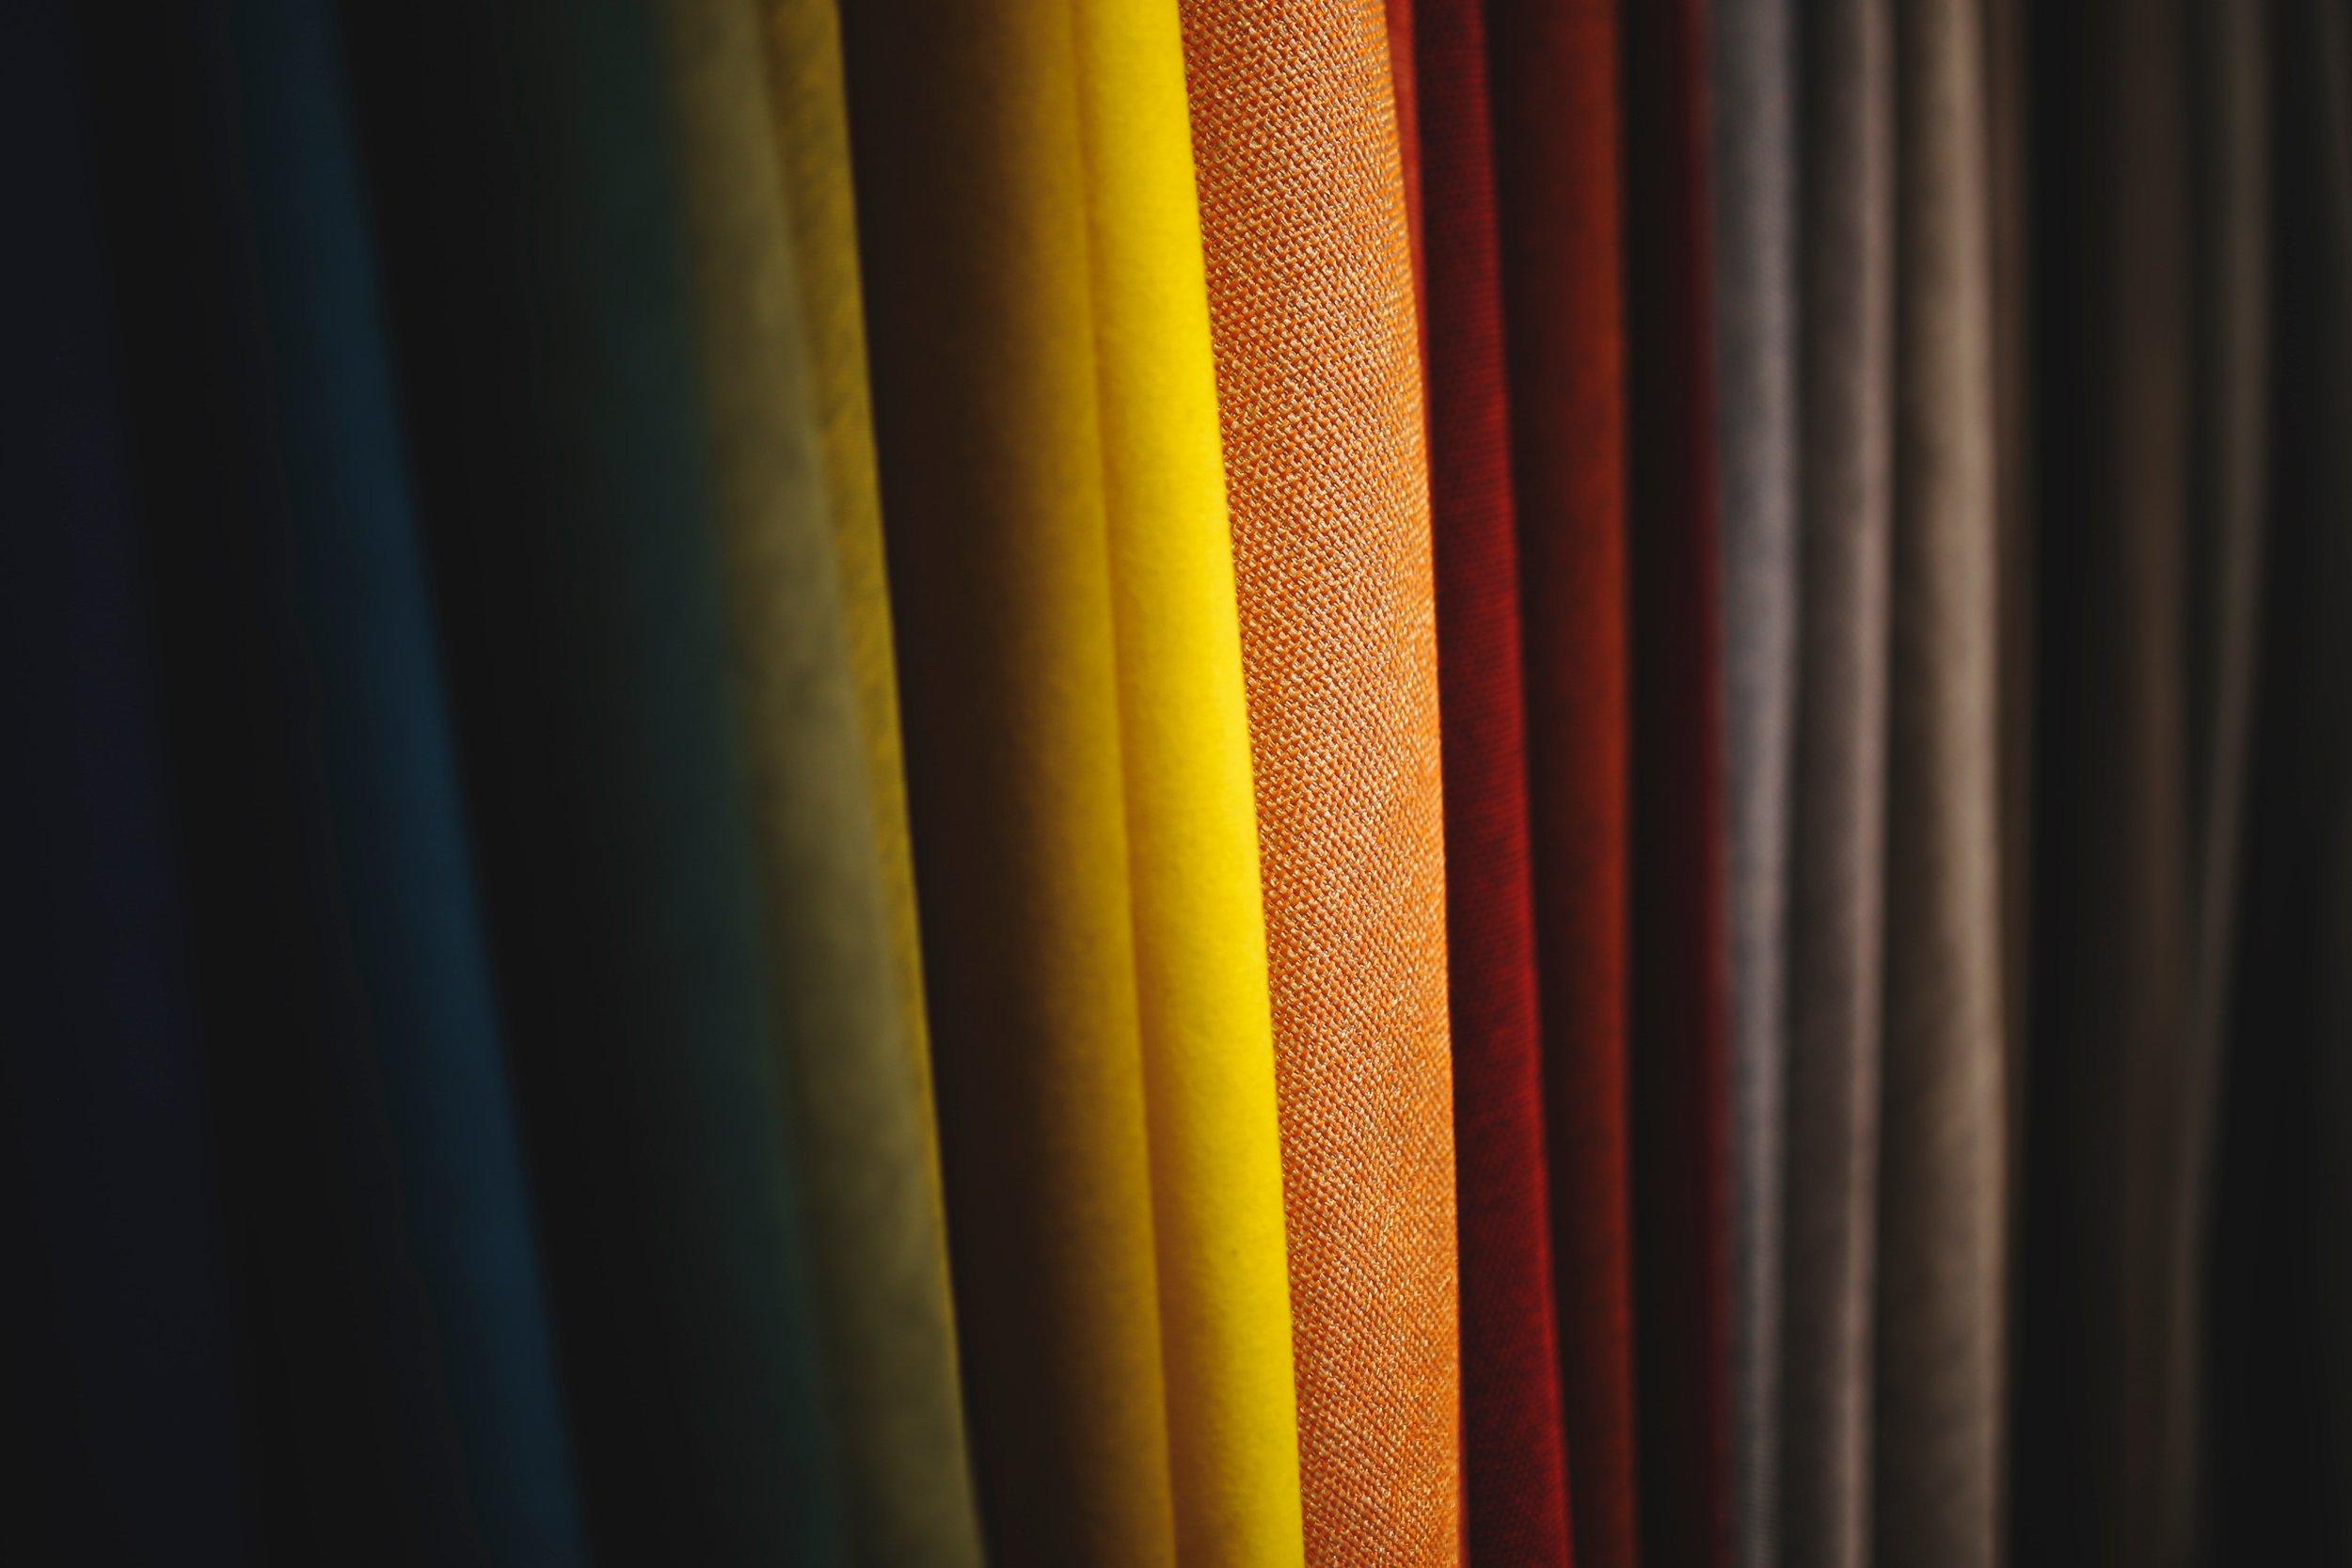 PÔLES / TISSUS / DRAPS - Alendel | Saltex | Joanne Fabrics | Maxwell Fabrics | Unique | Patlin | Commonwealth | Altro Design | Claire Deco